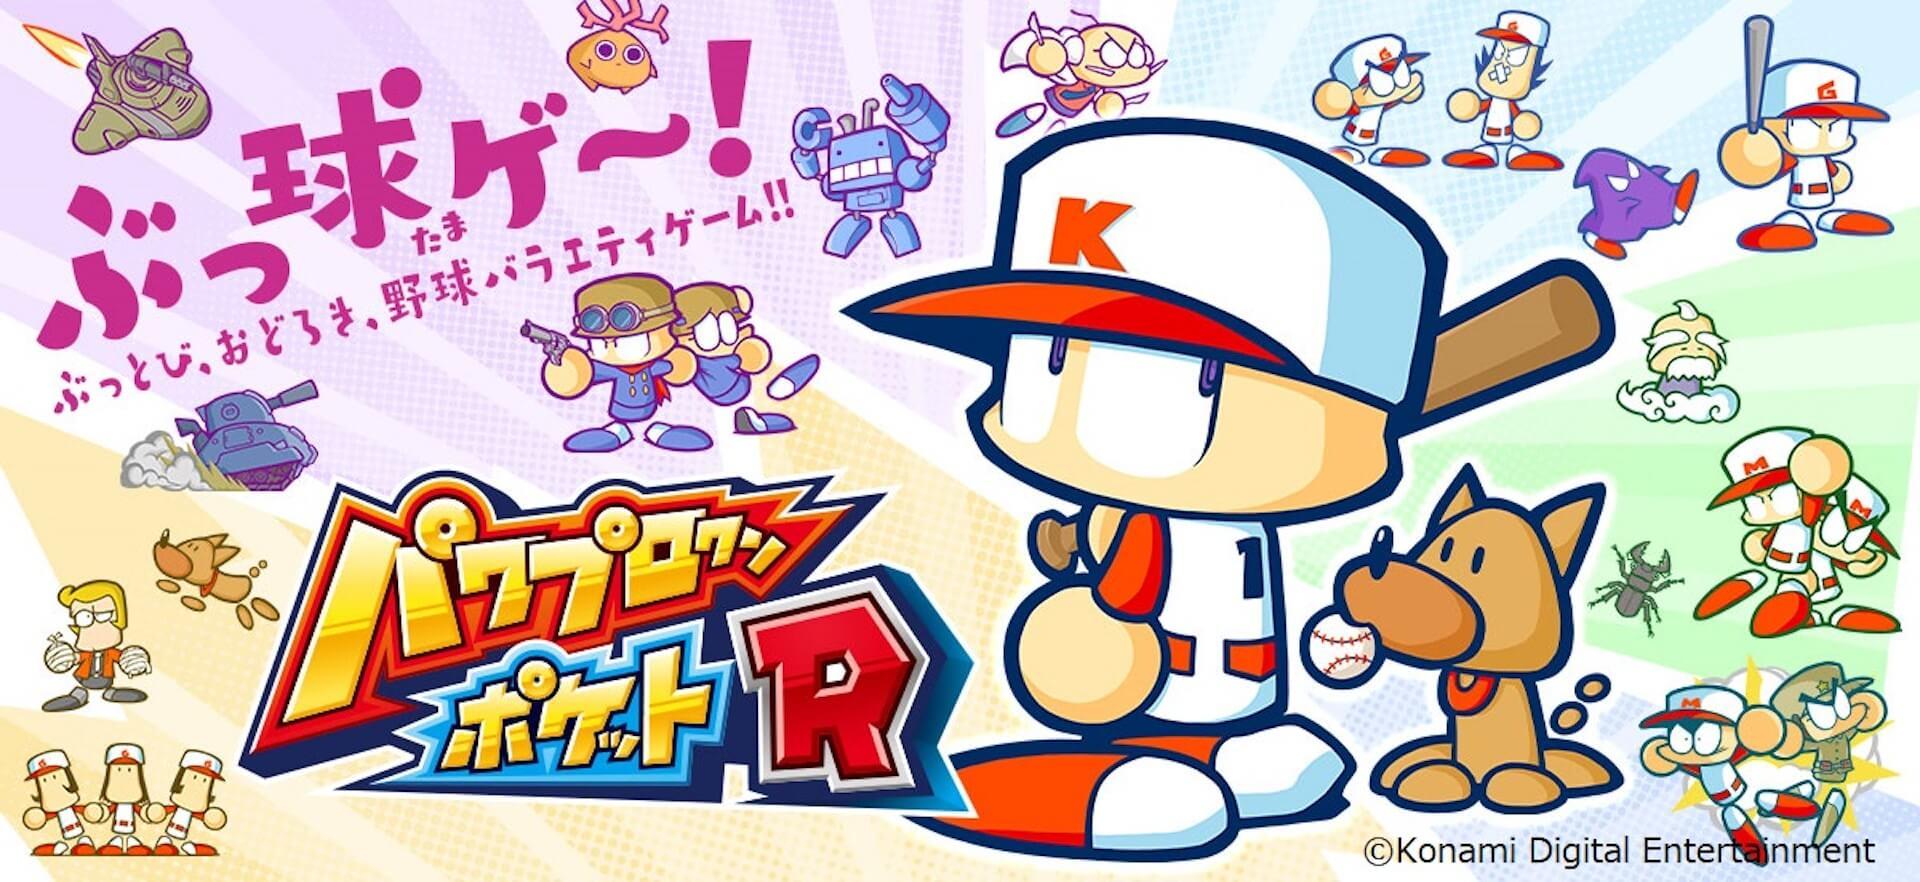 Nintendo Switch『パワプロクンポケットR』の発売日が11月25日に決定!DLCパワポケダッシュも早期購入特典に tech210805_pawapoker_1